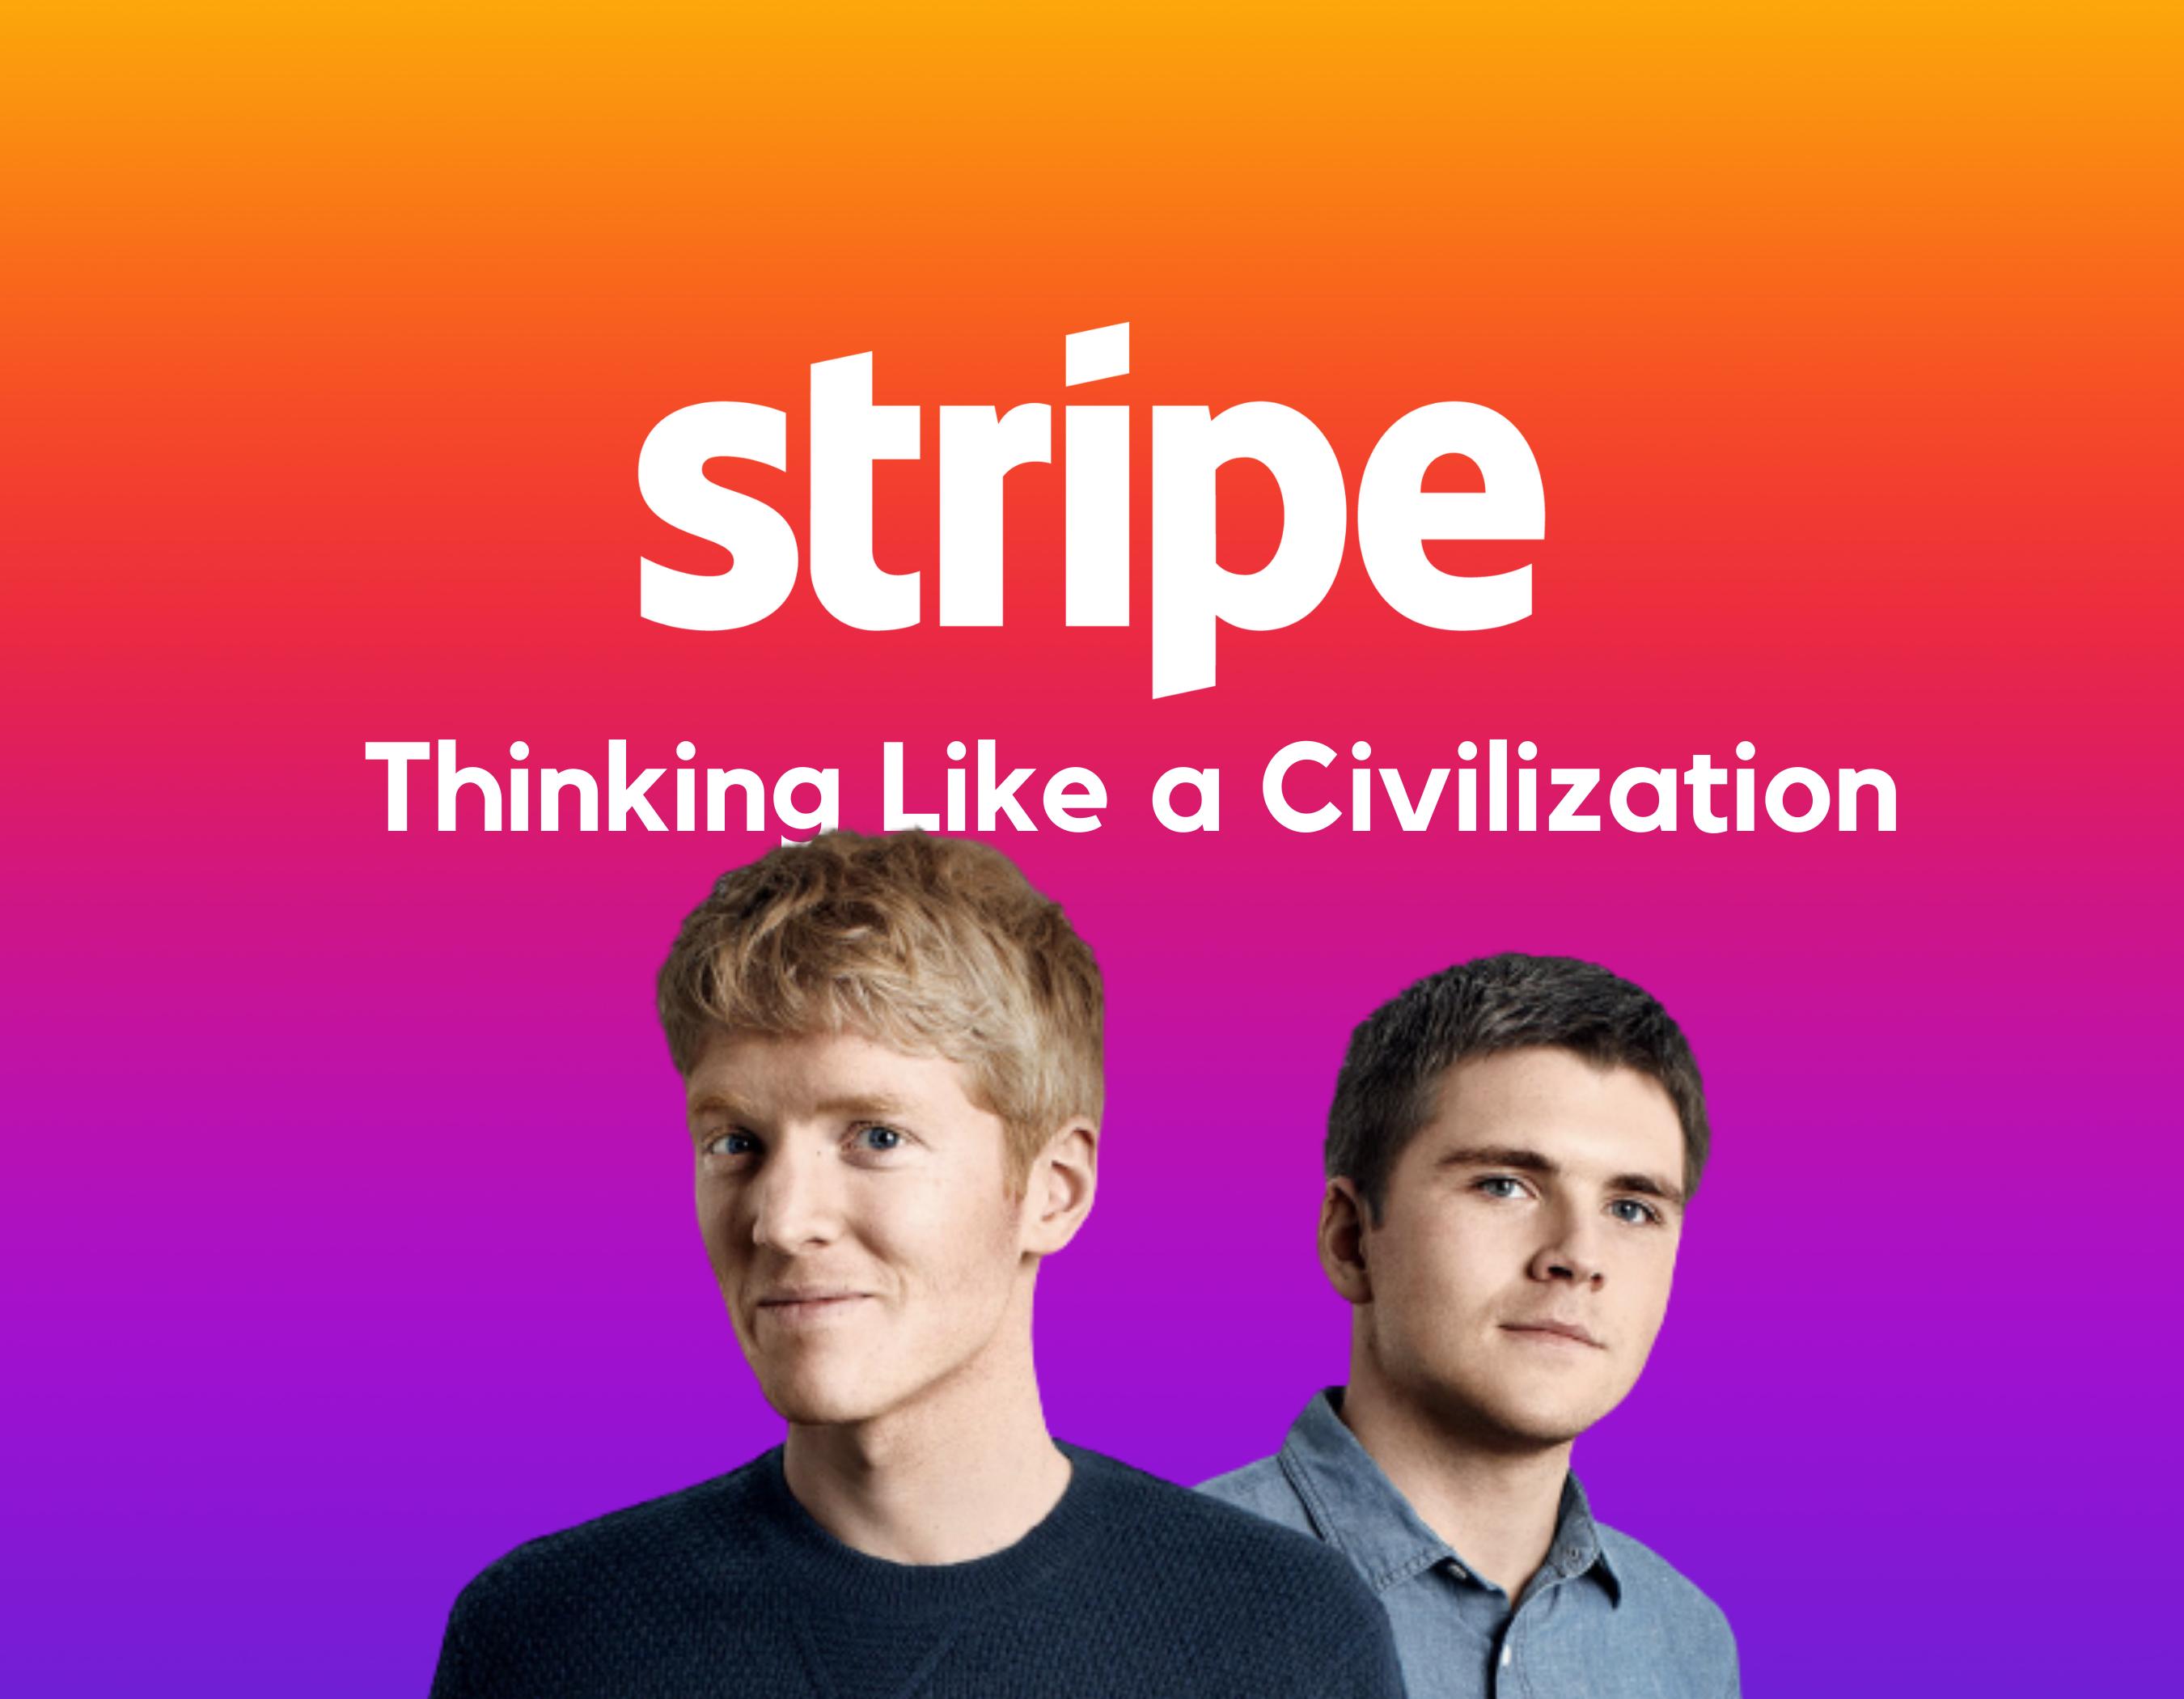 Stripe: Thinking Like a Civilization | The Generalist